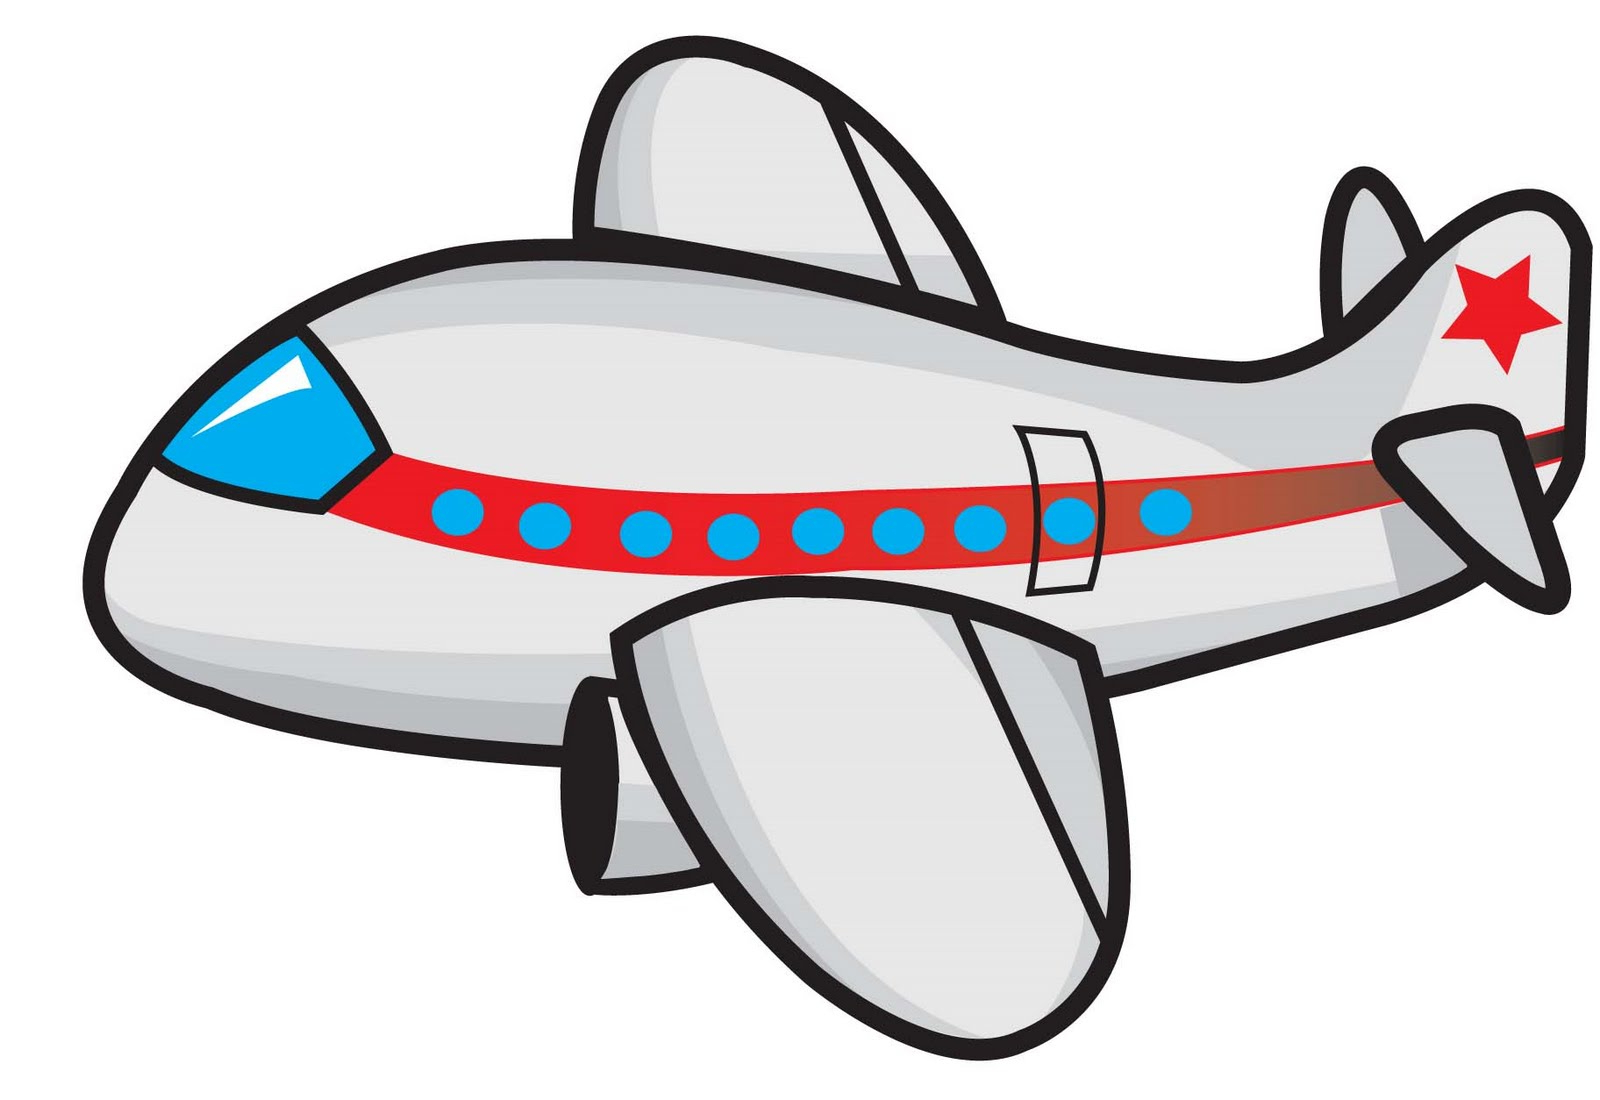 1600x1100 Airplane Cartoon Drawings Free Download Clip Art Free Clip Art